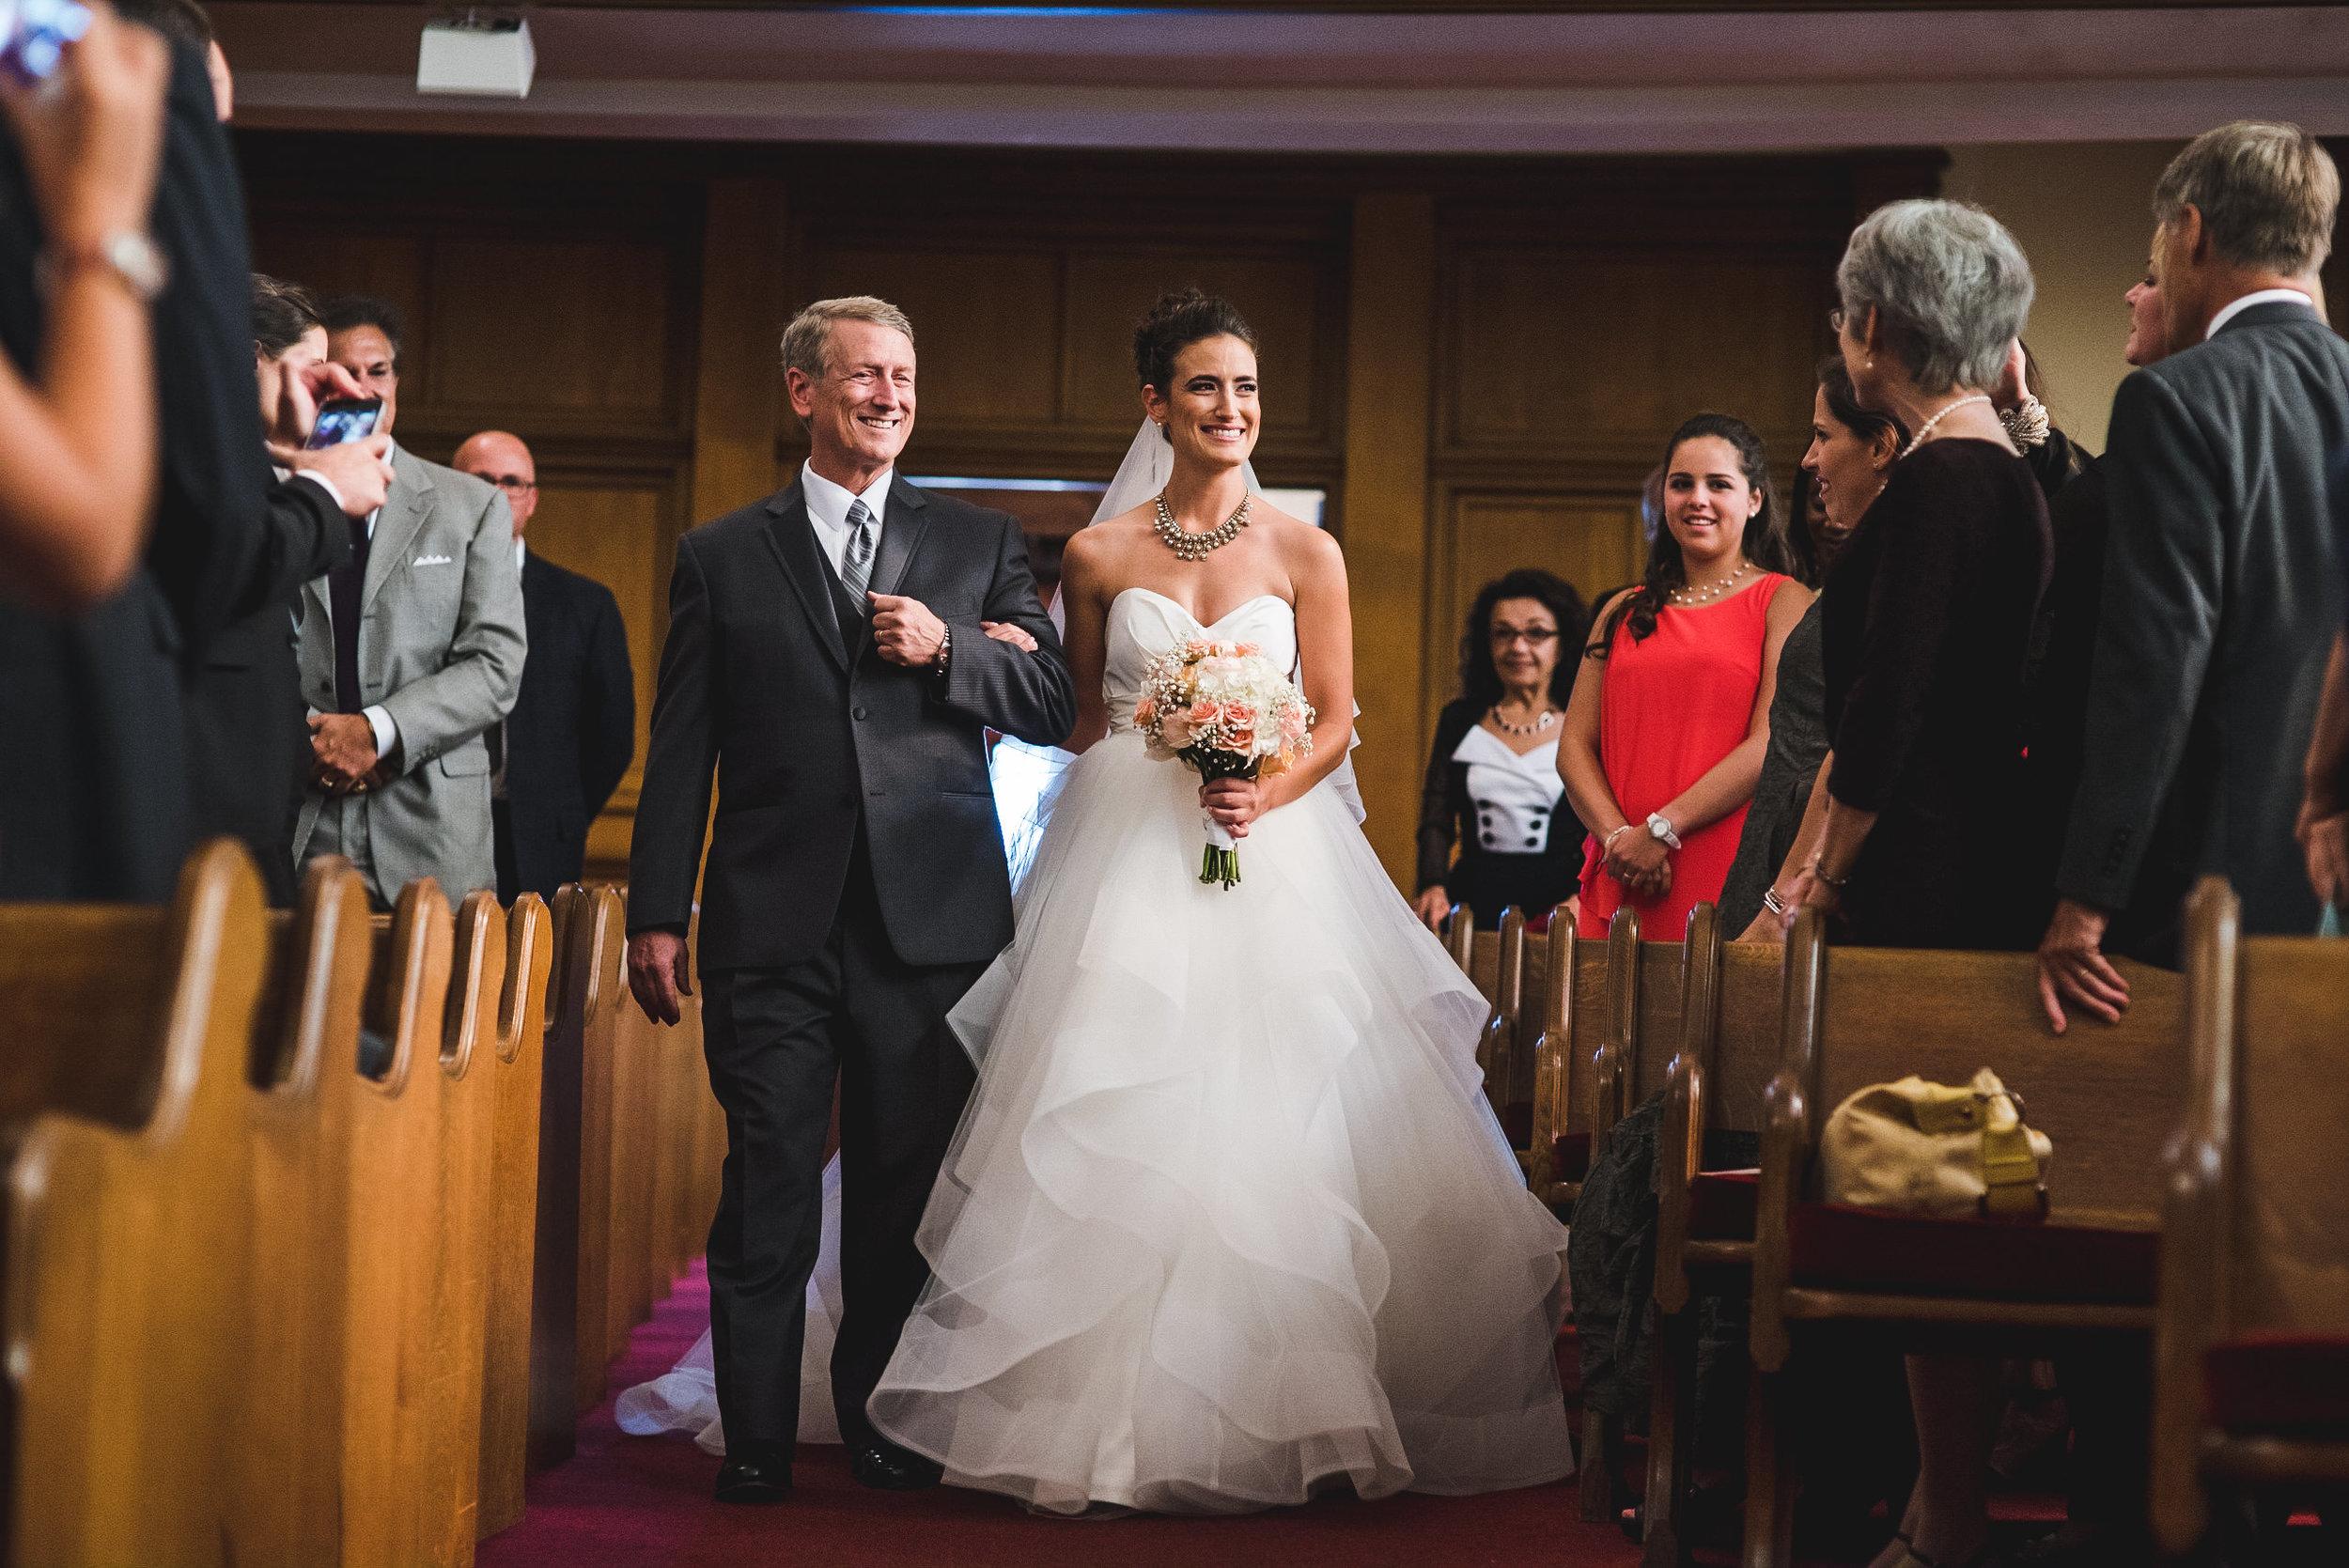 21c Museum Hotel Durham North Carolina Wedding-21.jpg